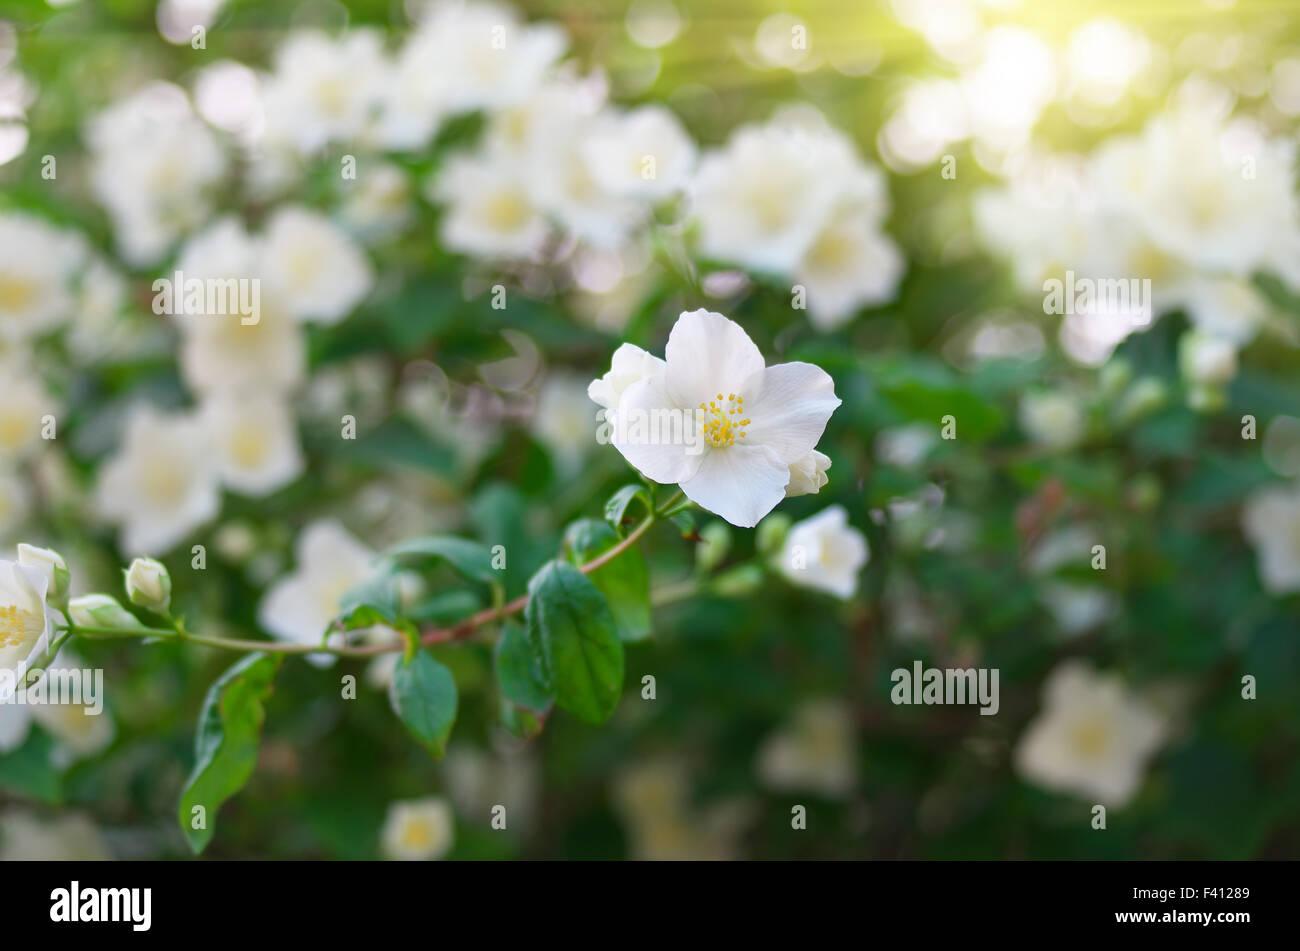 Jasmine flower composition of nature stock photo 88534217 alamy jasmine flower composition of nature izmirmasajfo